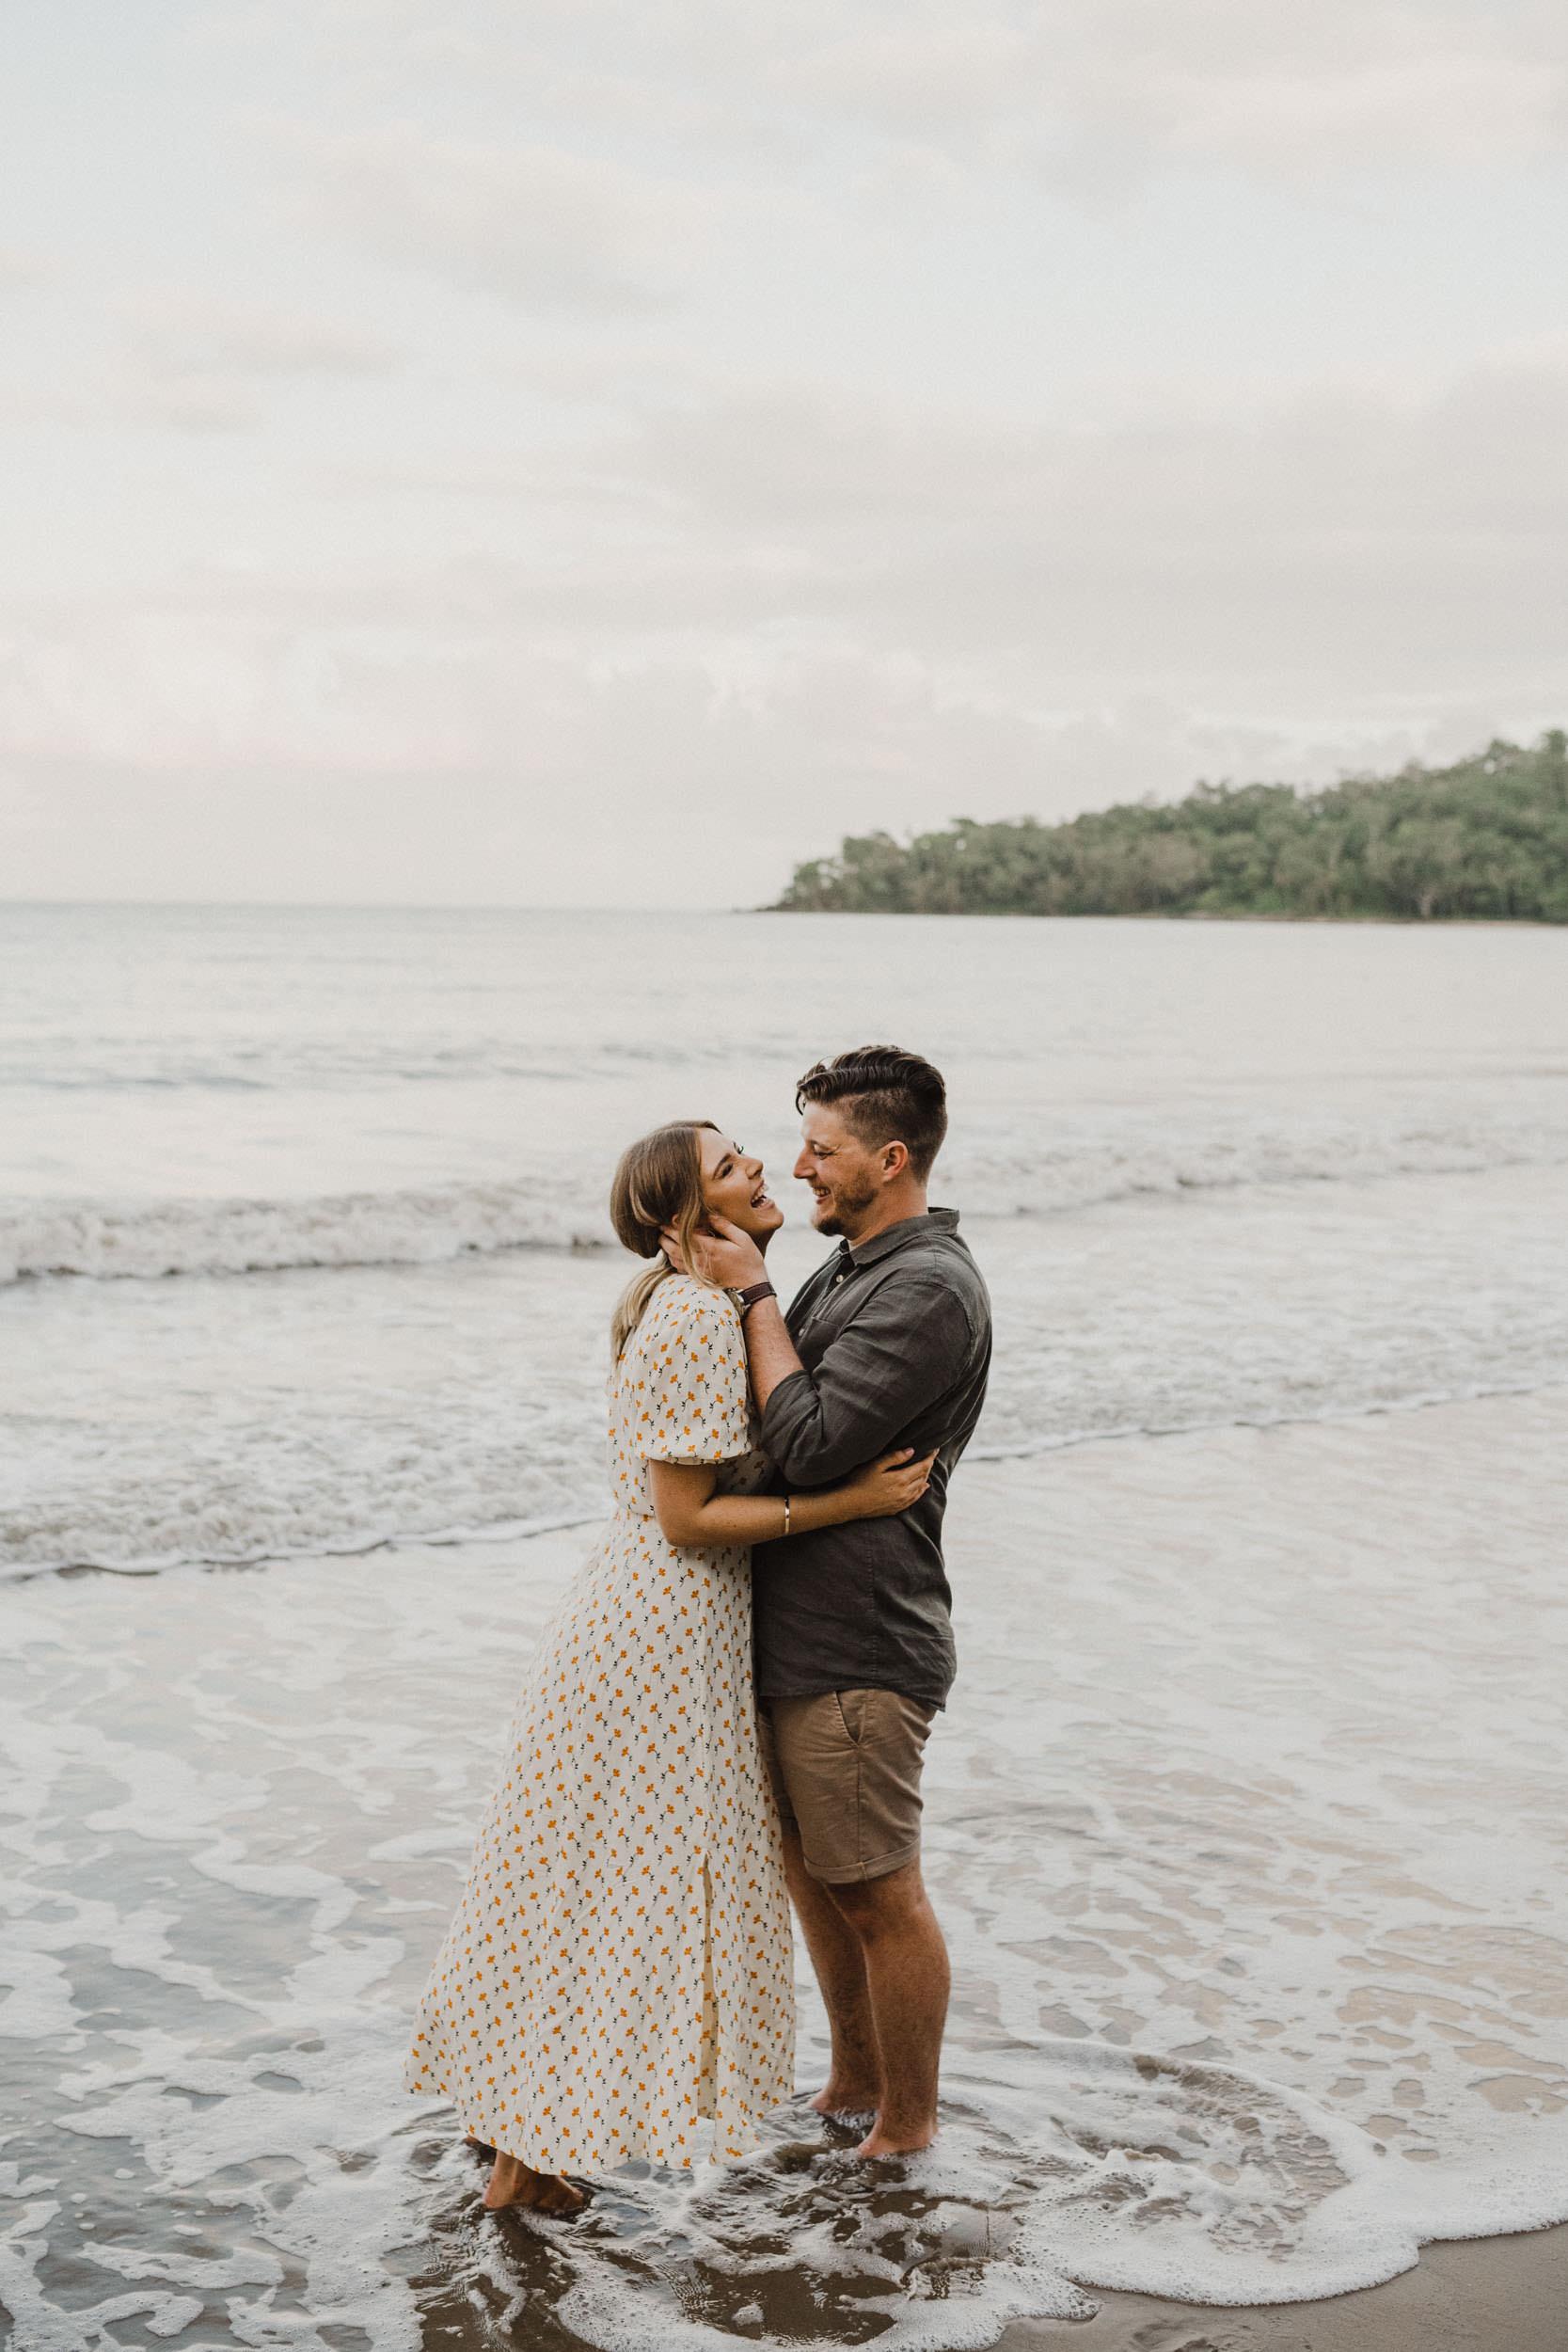 The Raw Photographer - Cairns Wedding Photographer - Beach Engagement Shoot - Candid Picnic-29.jpg